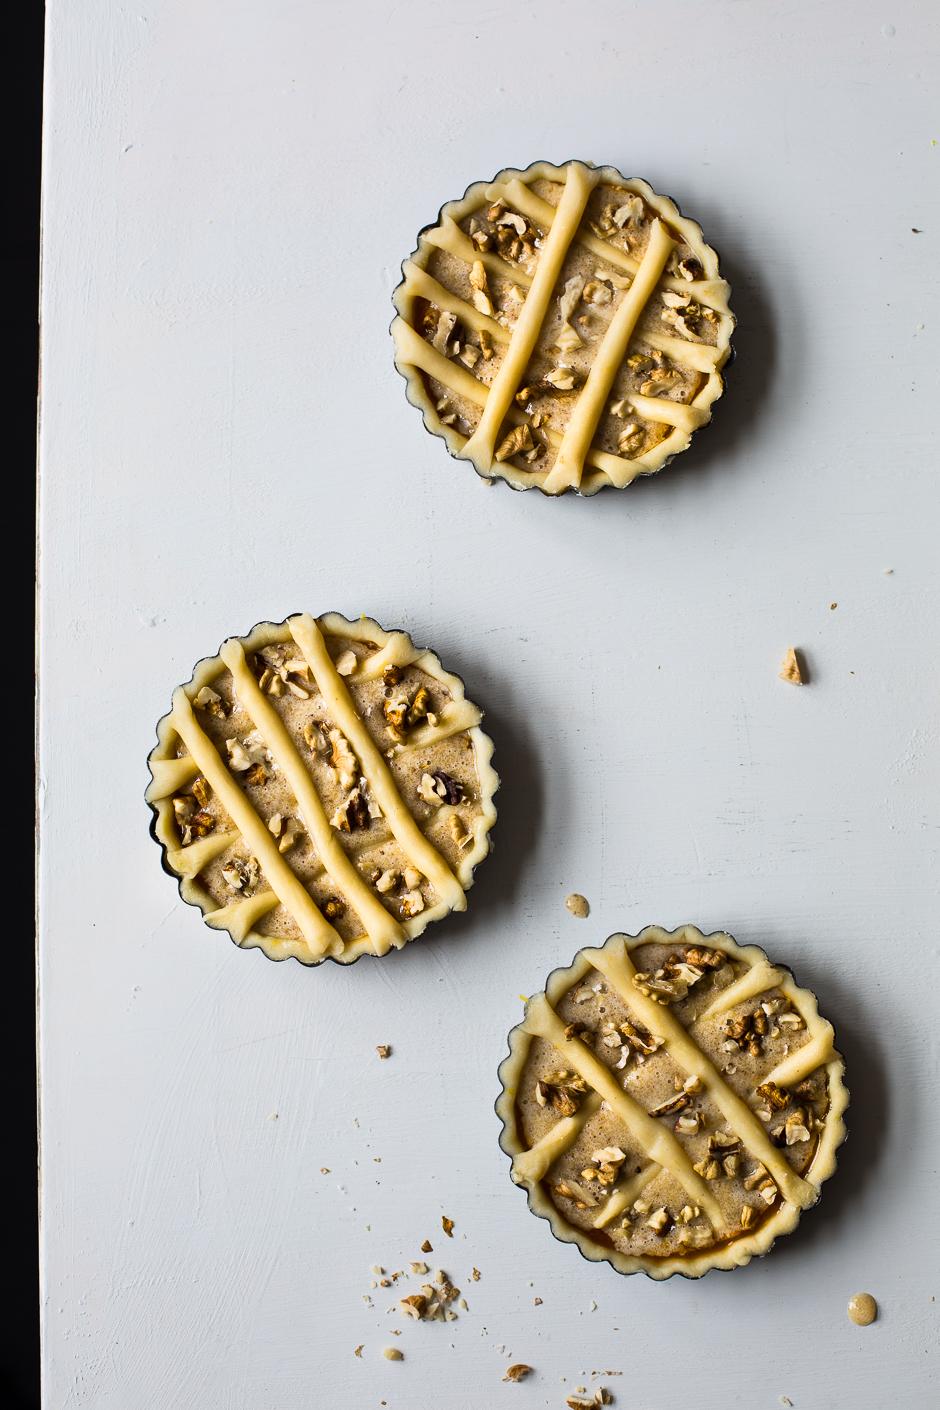 'mágnás' walnut pie from the Taste of Memories Hungarian country kitchen www.tasteofmemories.com